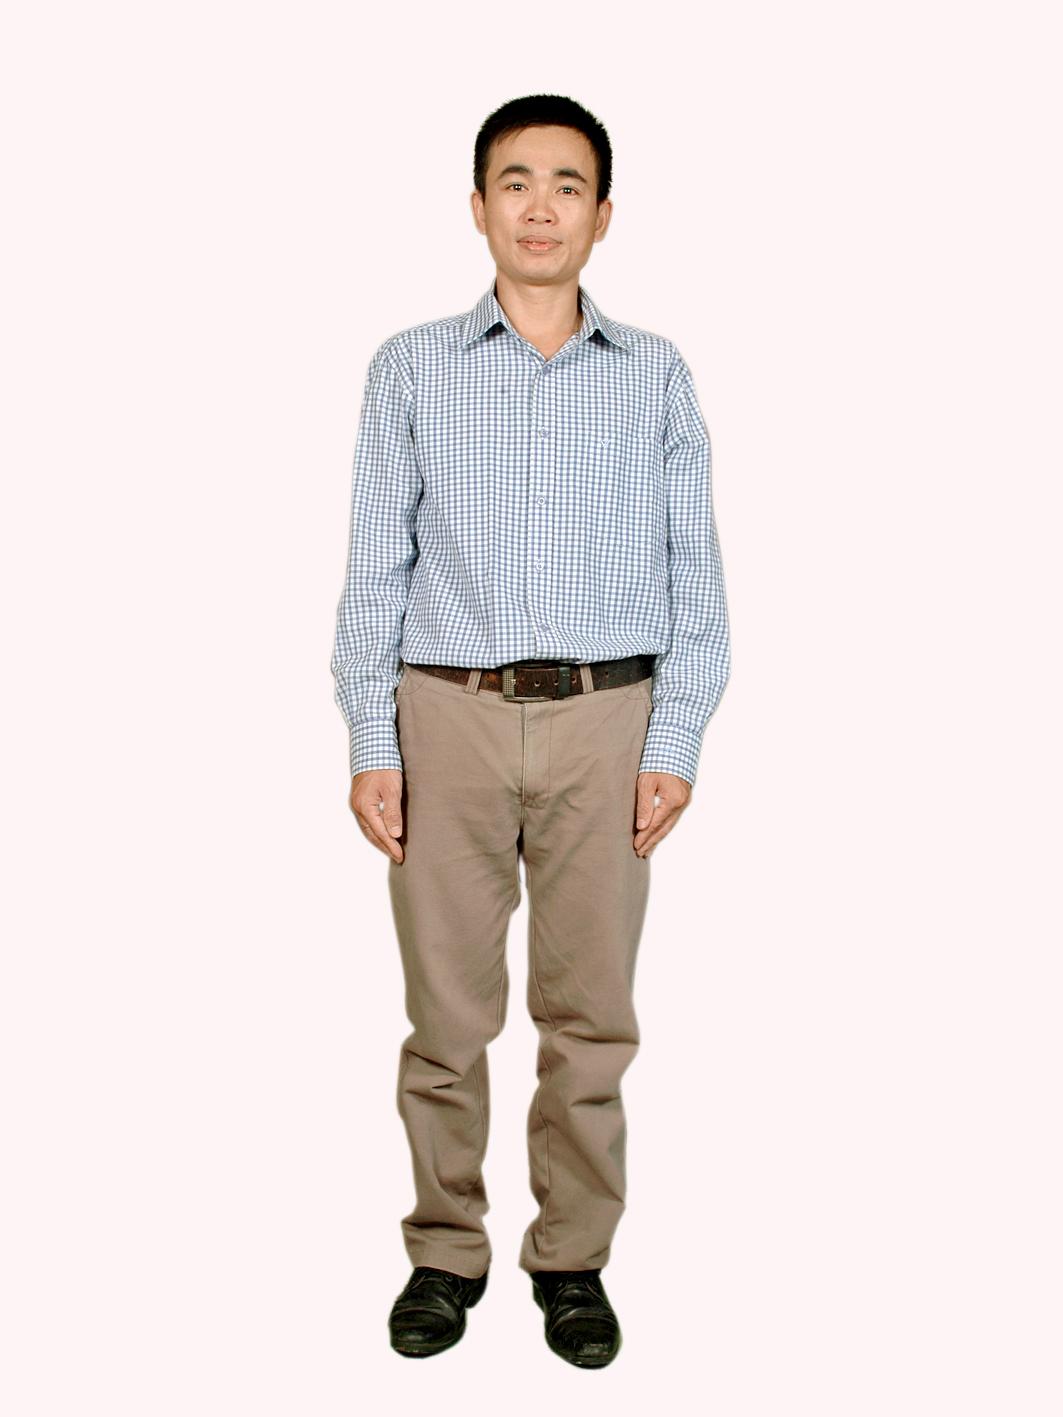 Phan Nhật Linh